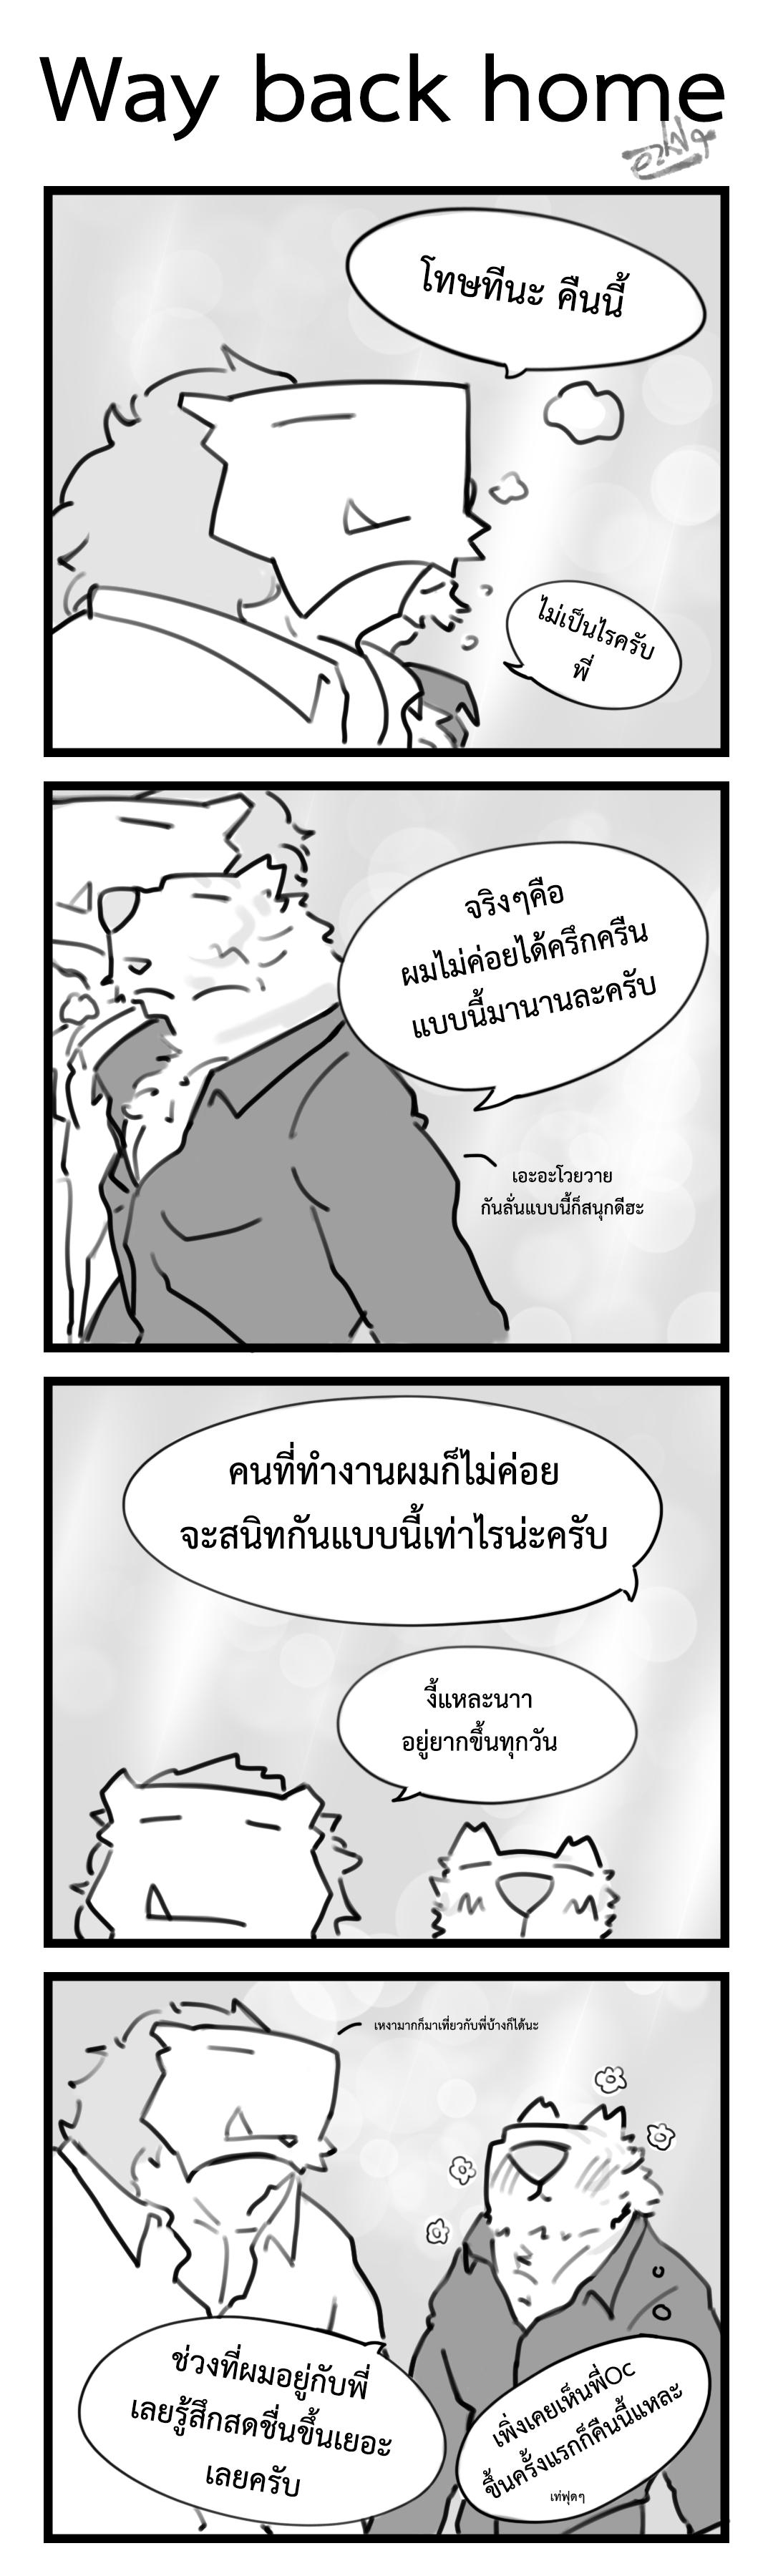 37 - Way back home